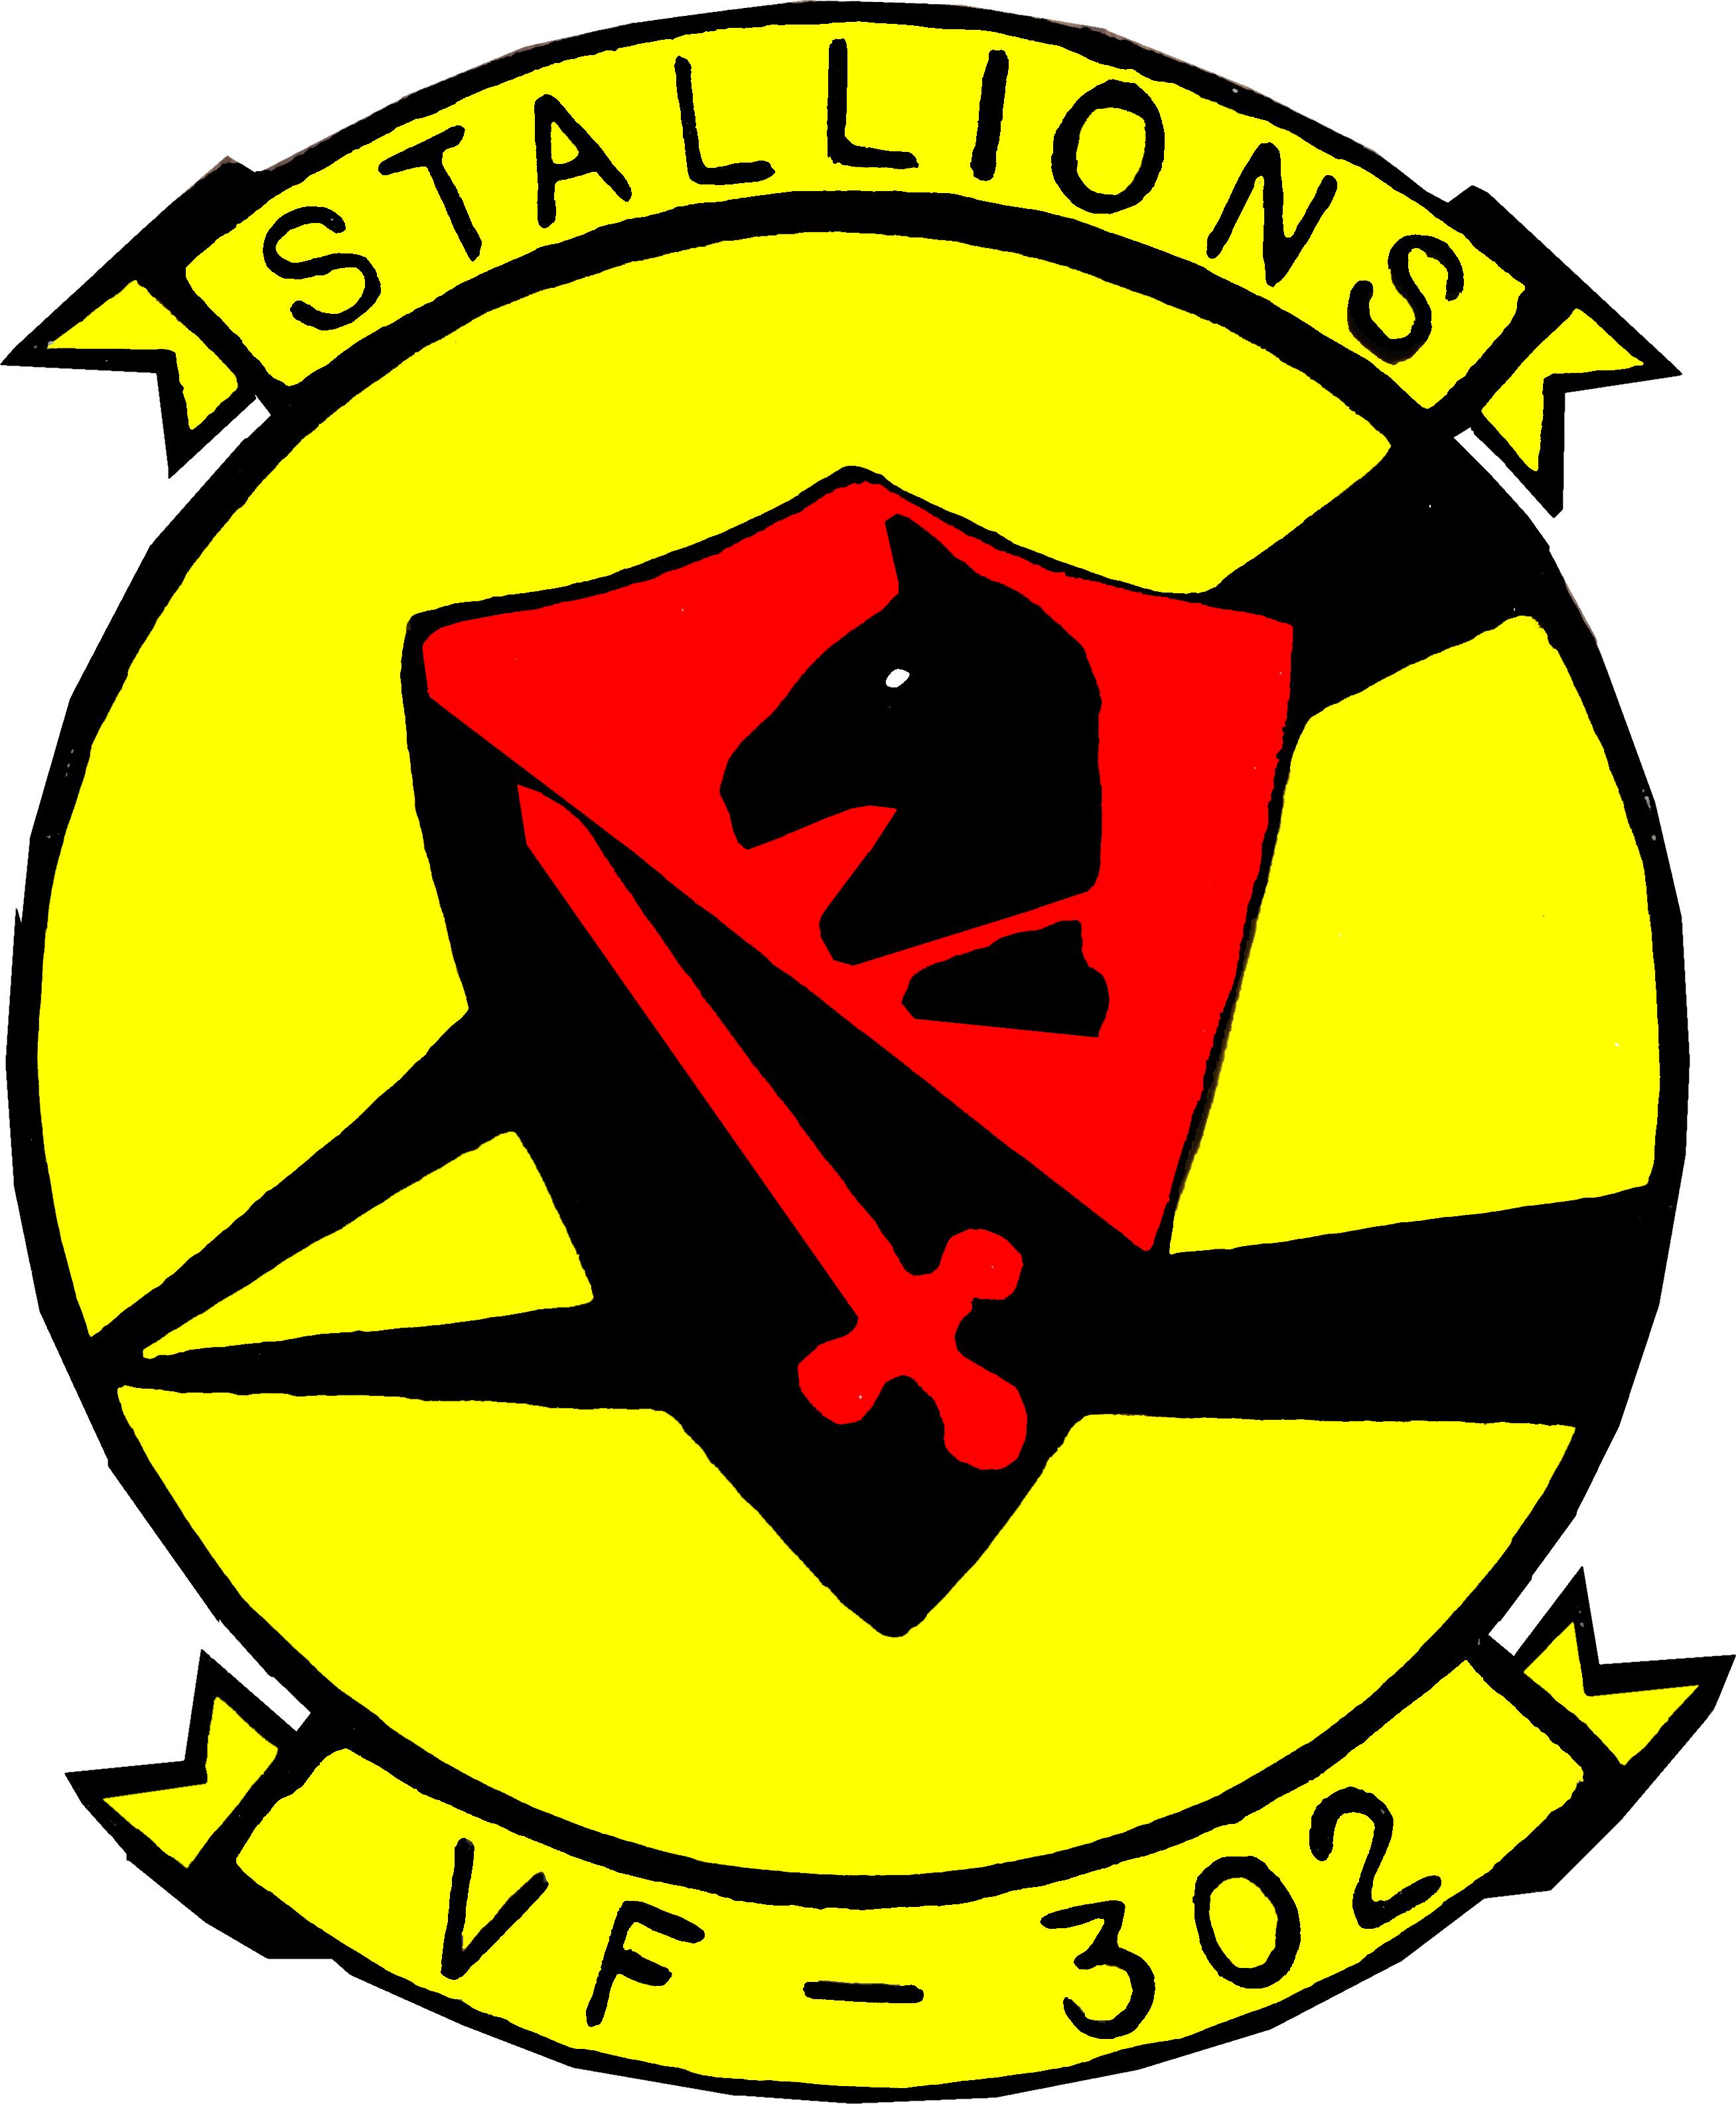 VF-302 - Wikipedia